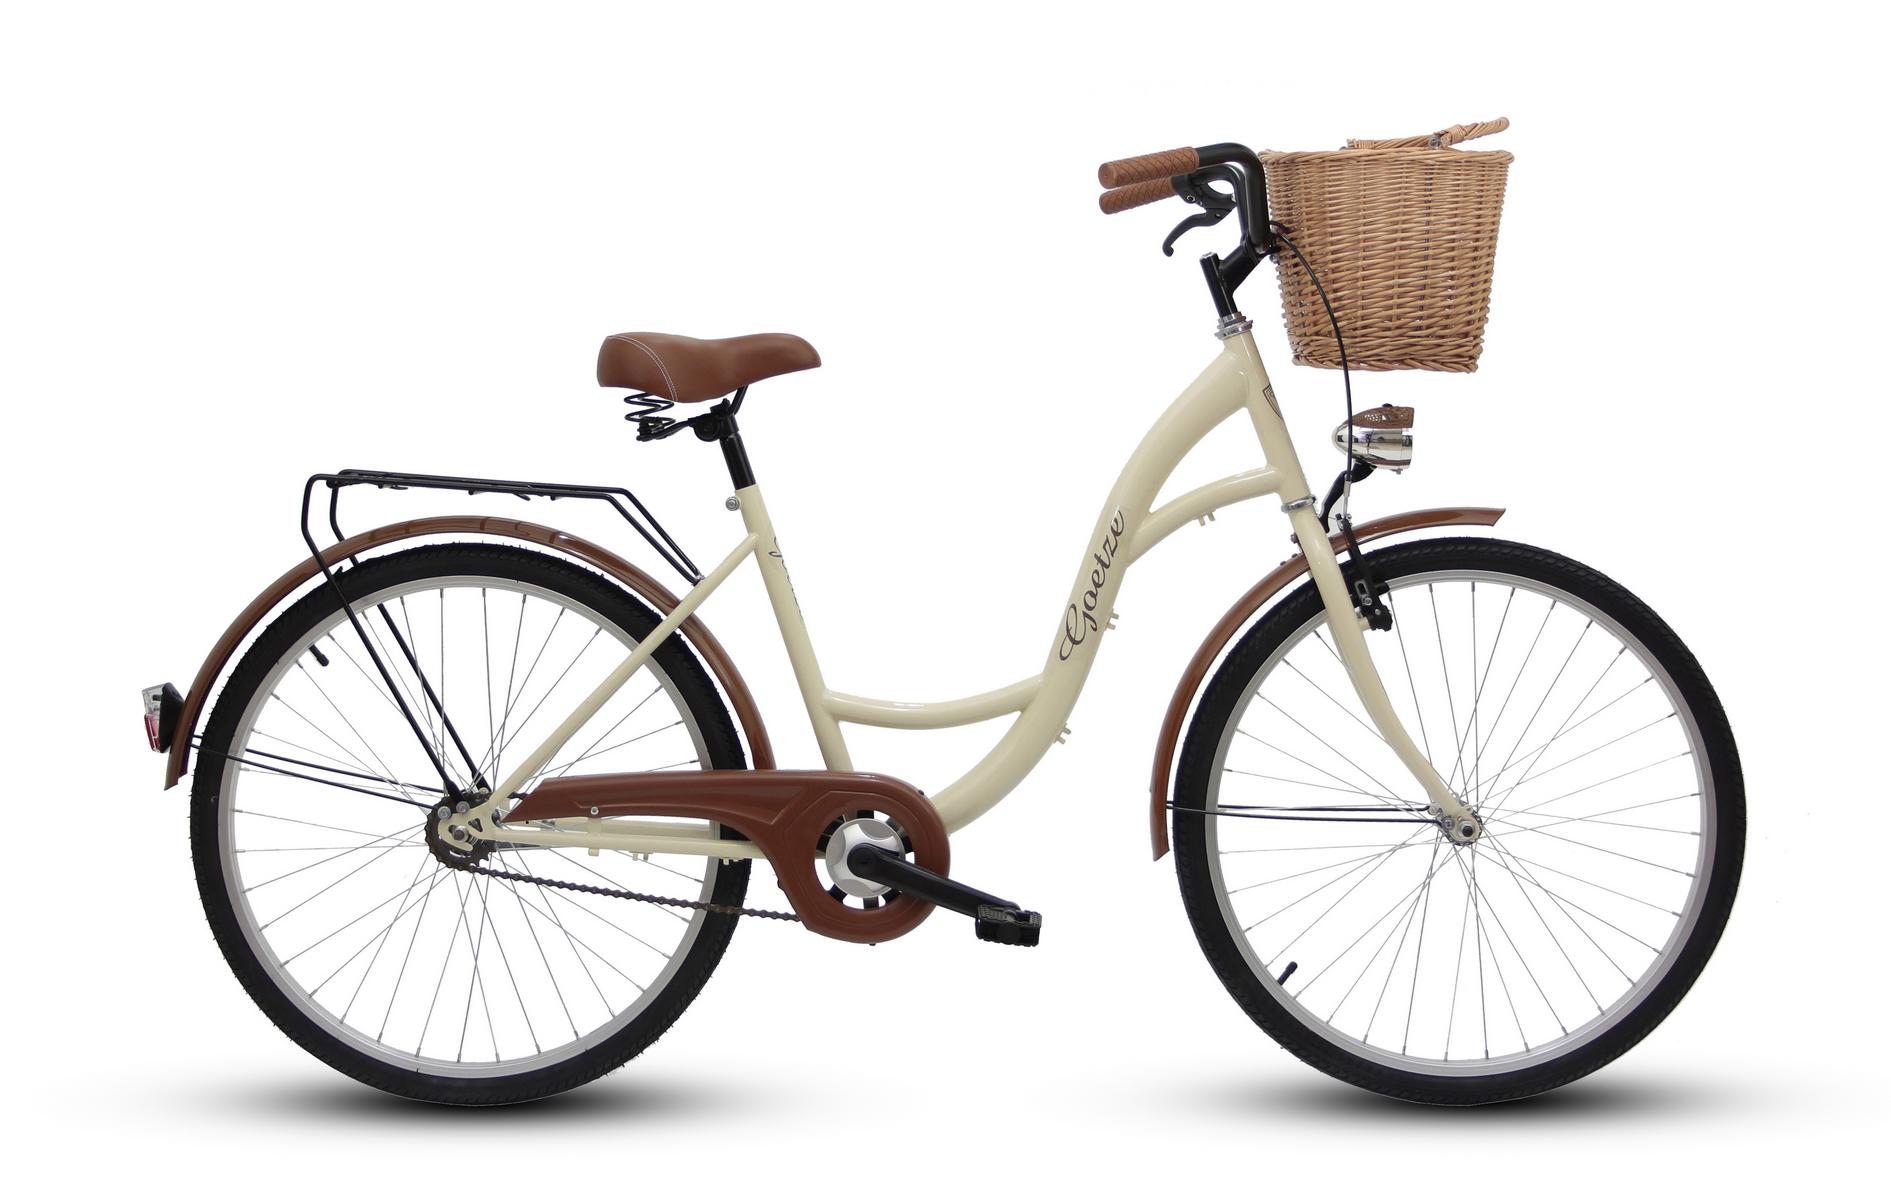 Женский городской велосипед GOETZE 26 eco lady + корзина !!!